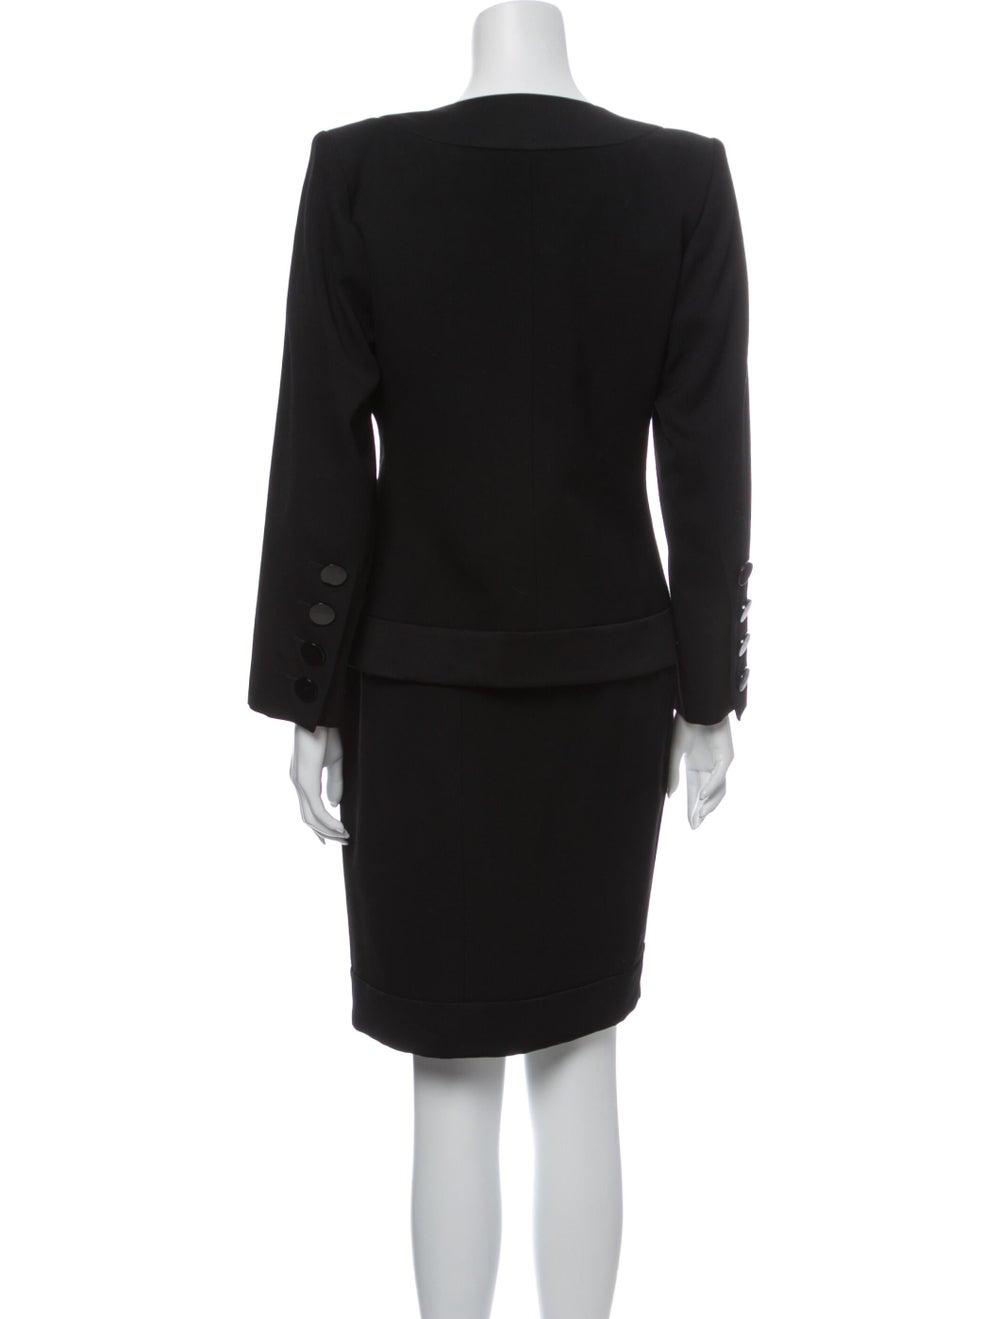 Yves Saint Laurent Vintage Skirt Suit Black - image 3